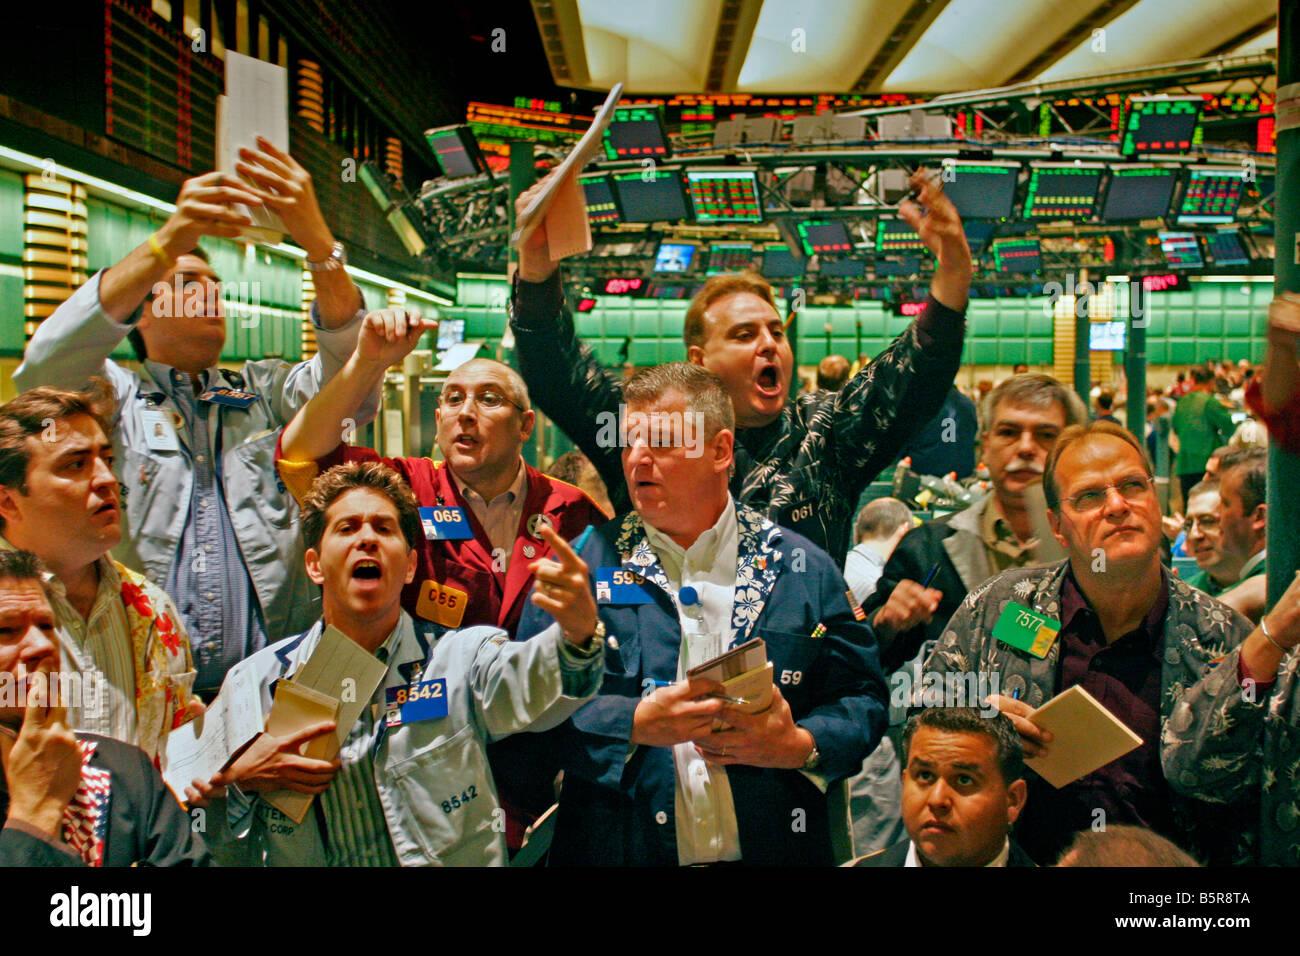 New York Board Of Trade Trading Floor Stock Photo Royalty